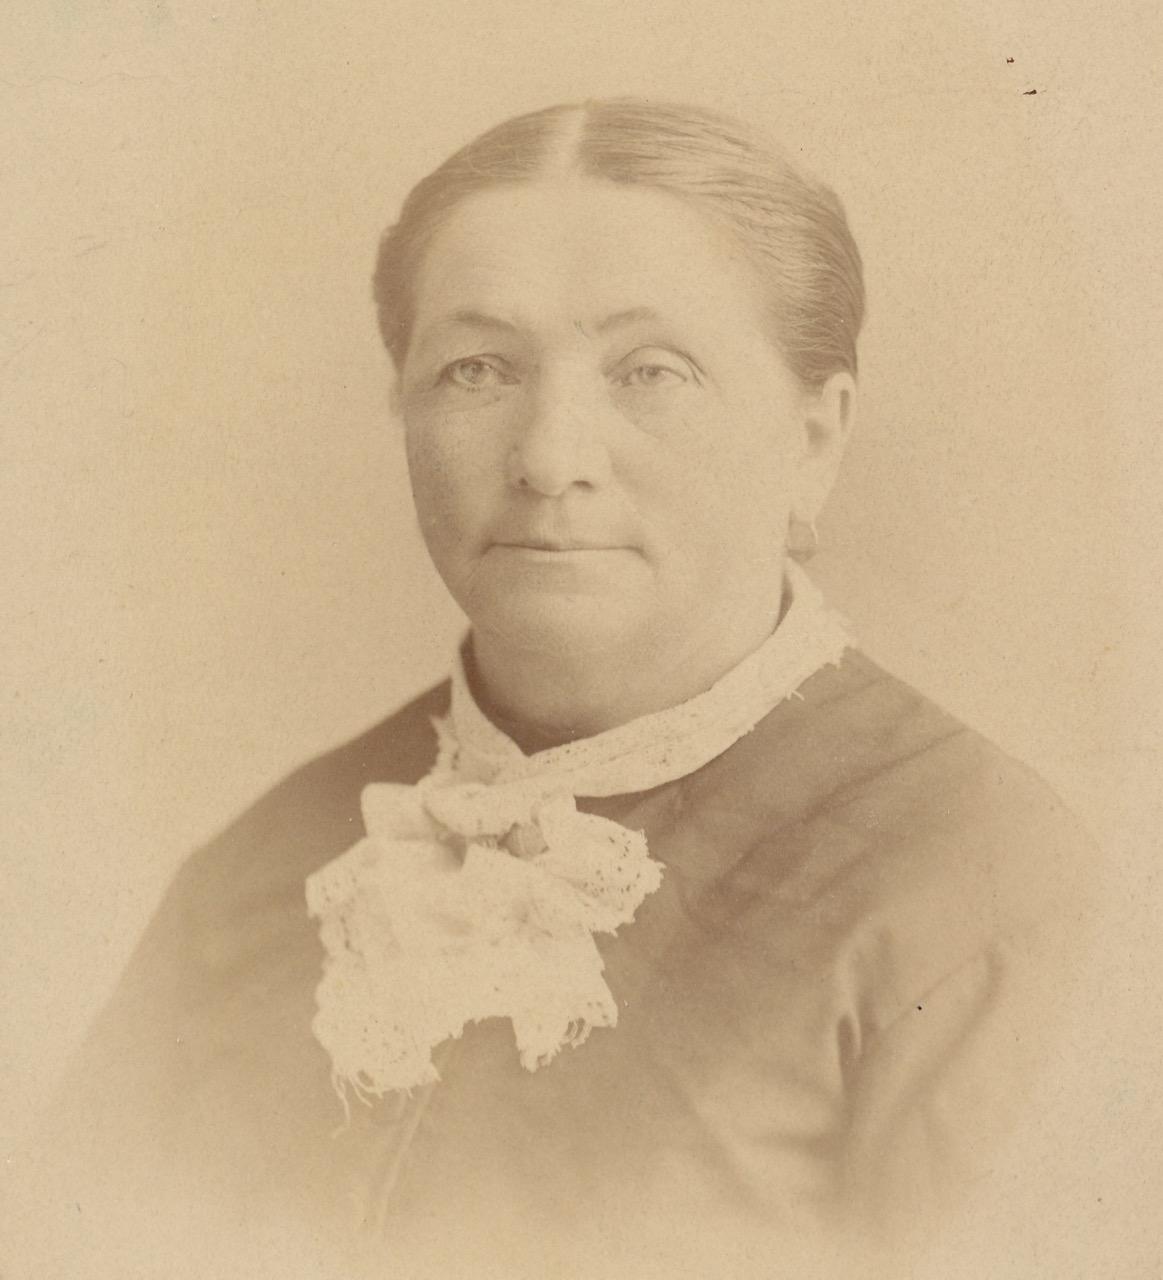 Agnes Hahn Gerling-g-g-grandmother